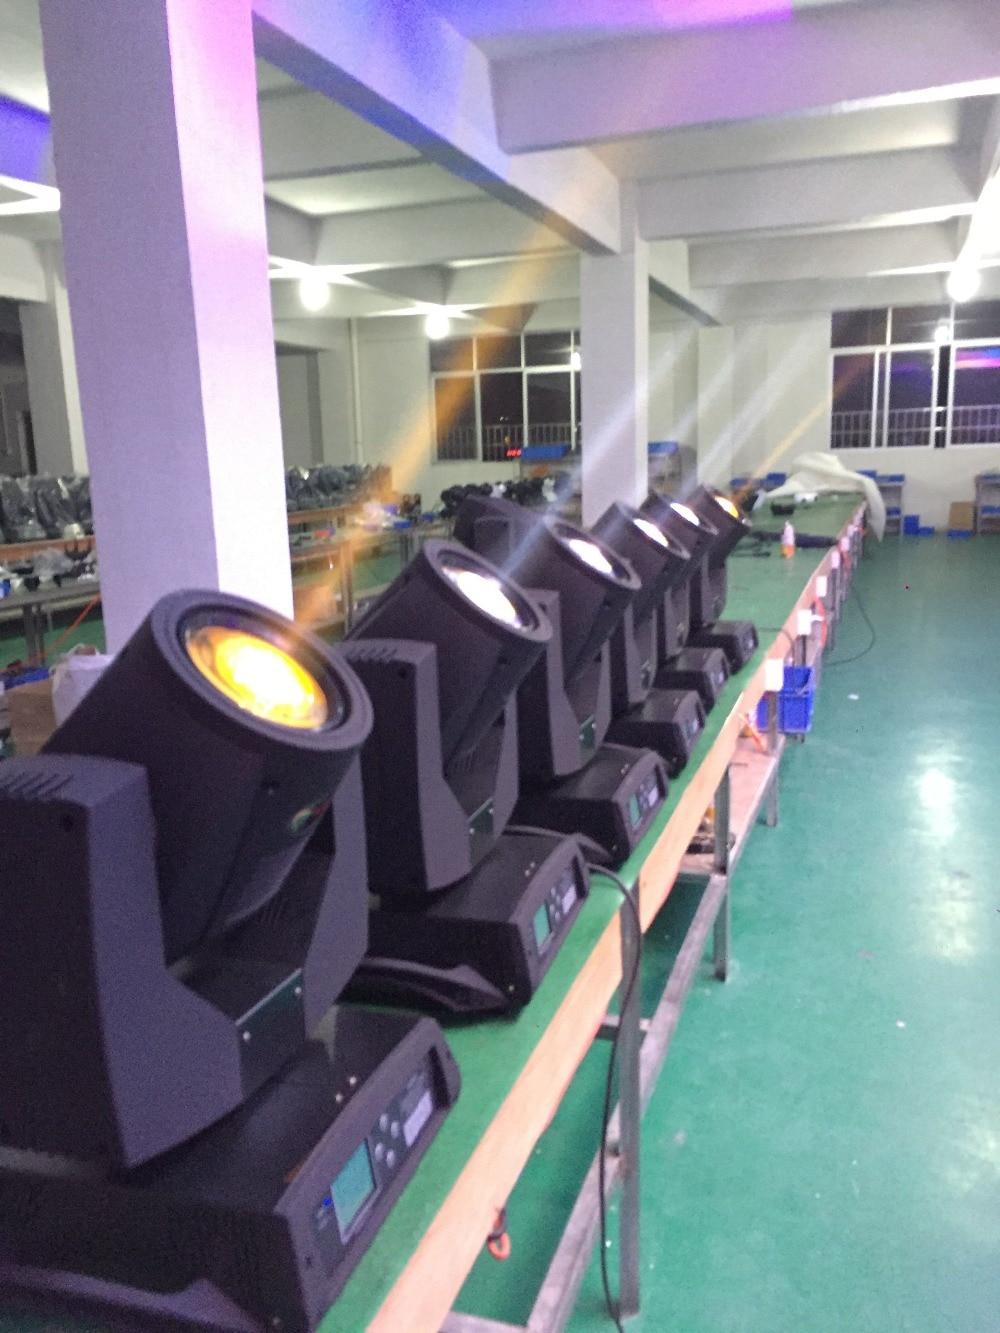 Fast shipping good quality beam 7r moving head 230W clay paky sharpy beam light touch screen dj equipment стоимость